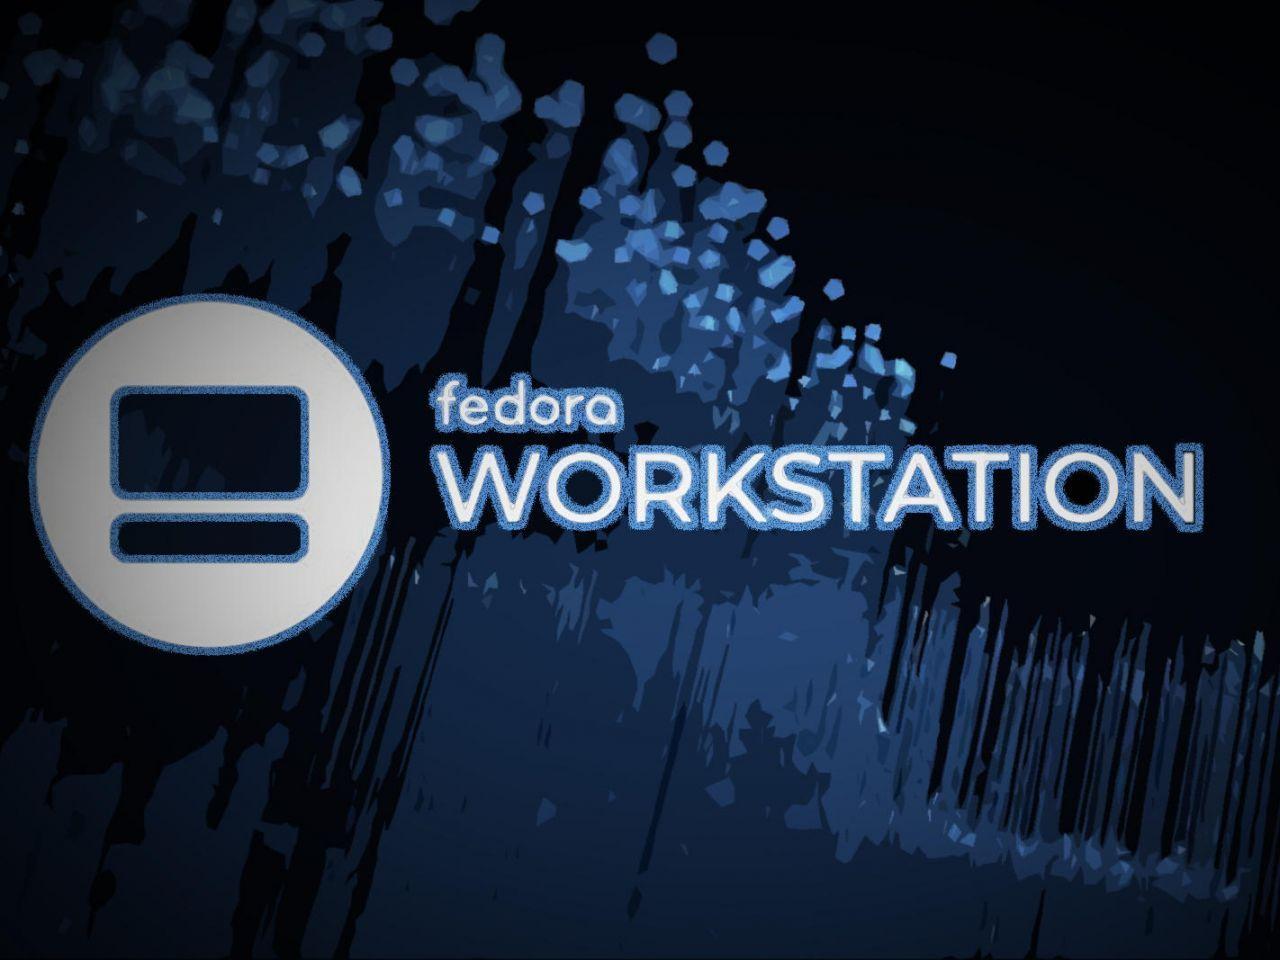 fedora 29 公開 ibmによるレッドハット買収が注目されるもコミュニティ